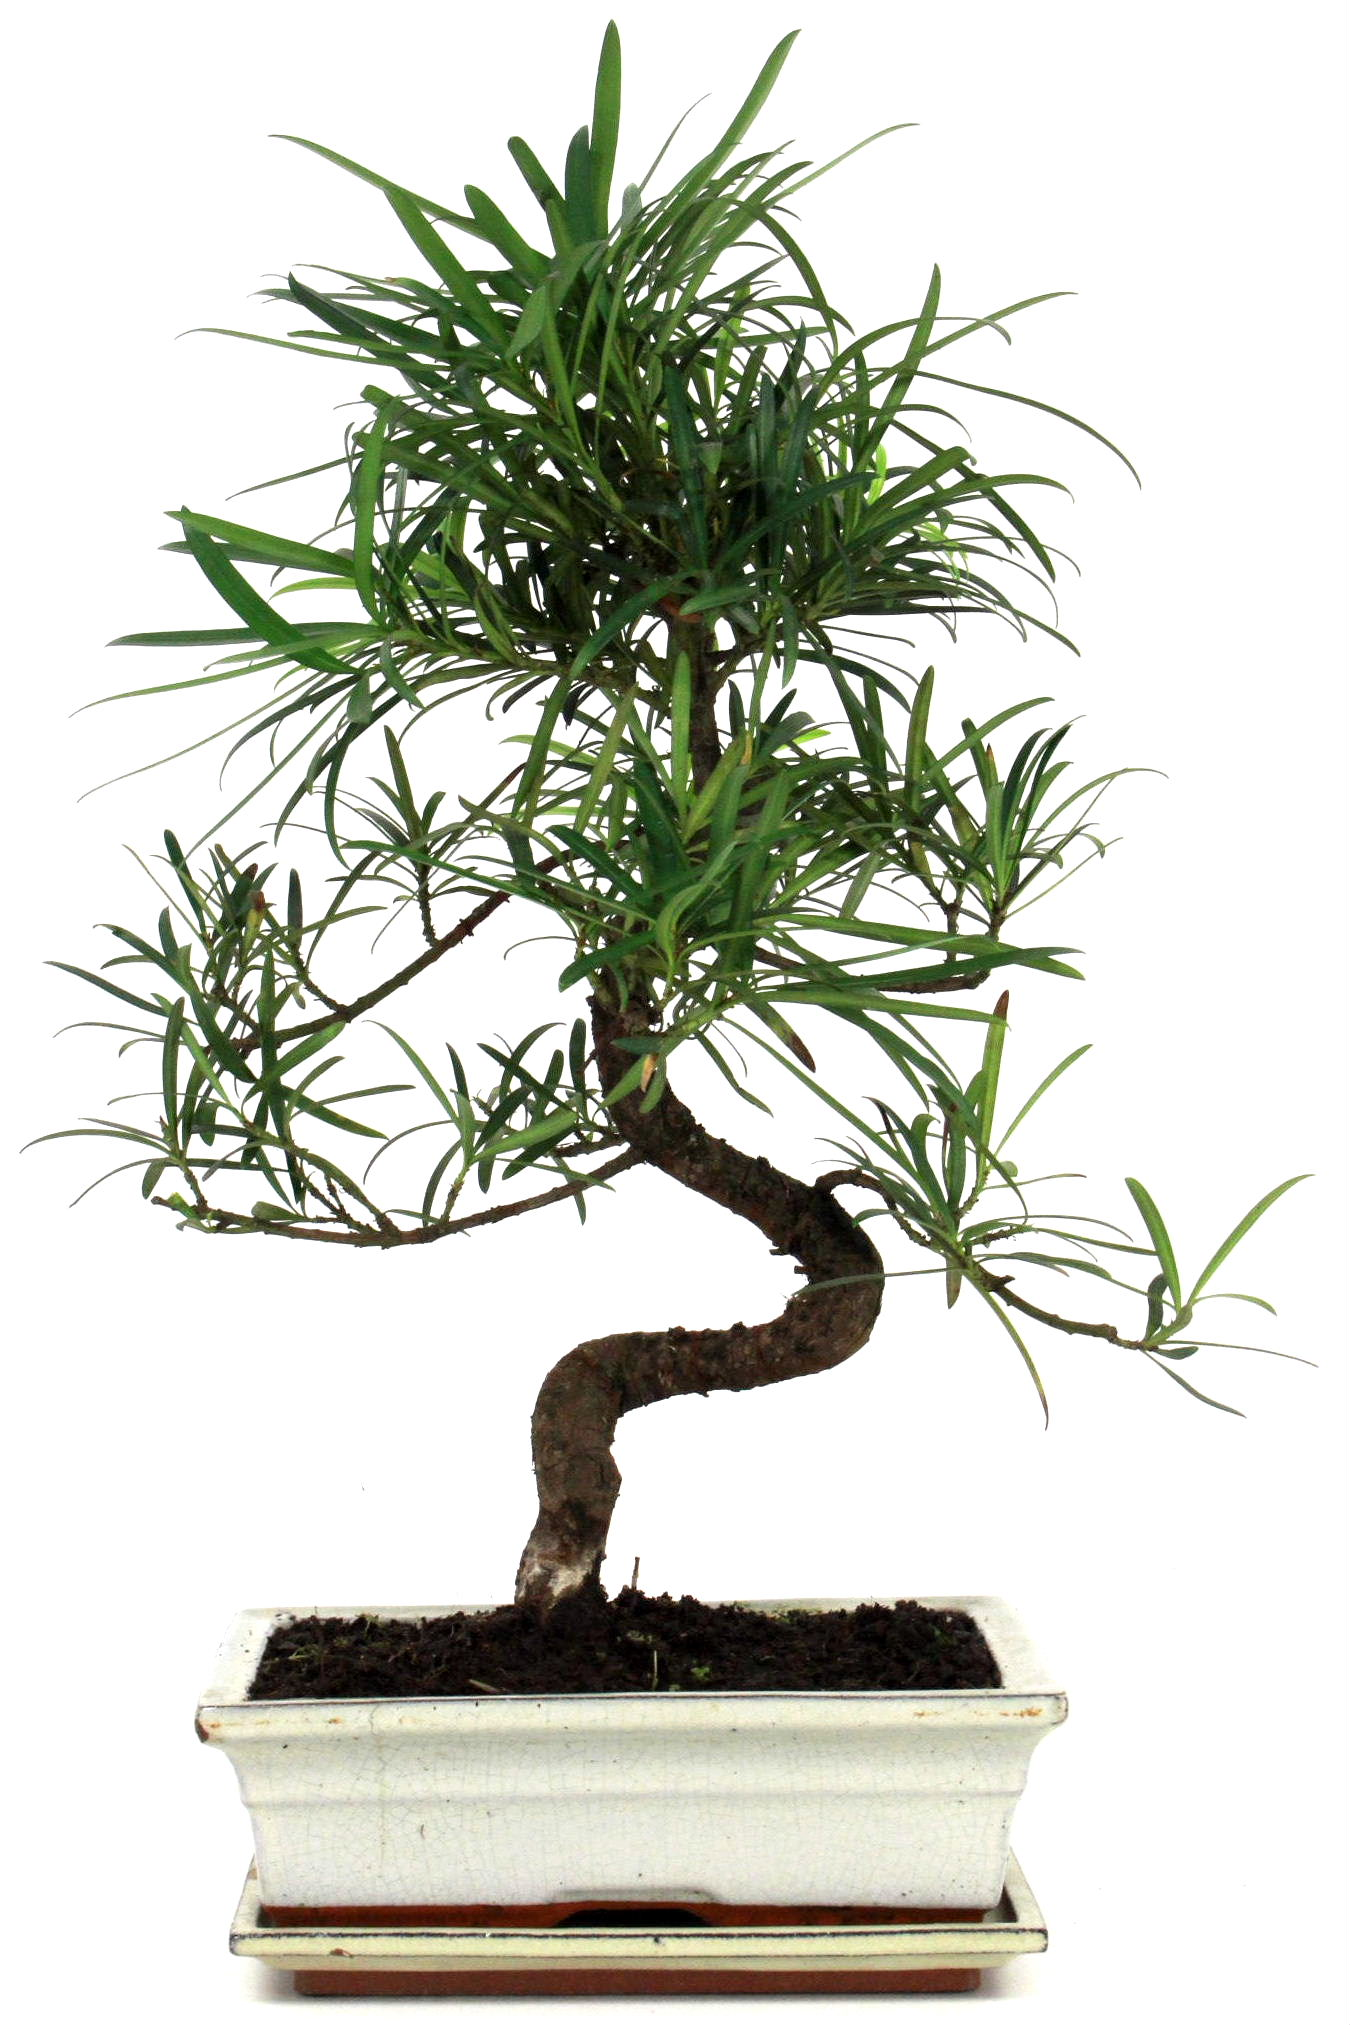 steineibe bonsai 45 50 cm w242 bei oyaki bonsai kaufen. Black Bedroom Furniture Sets. Home Design Ideas